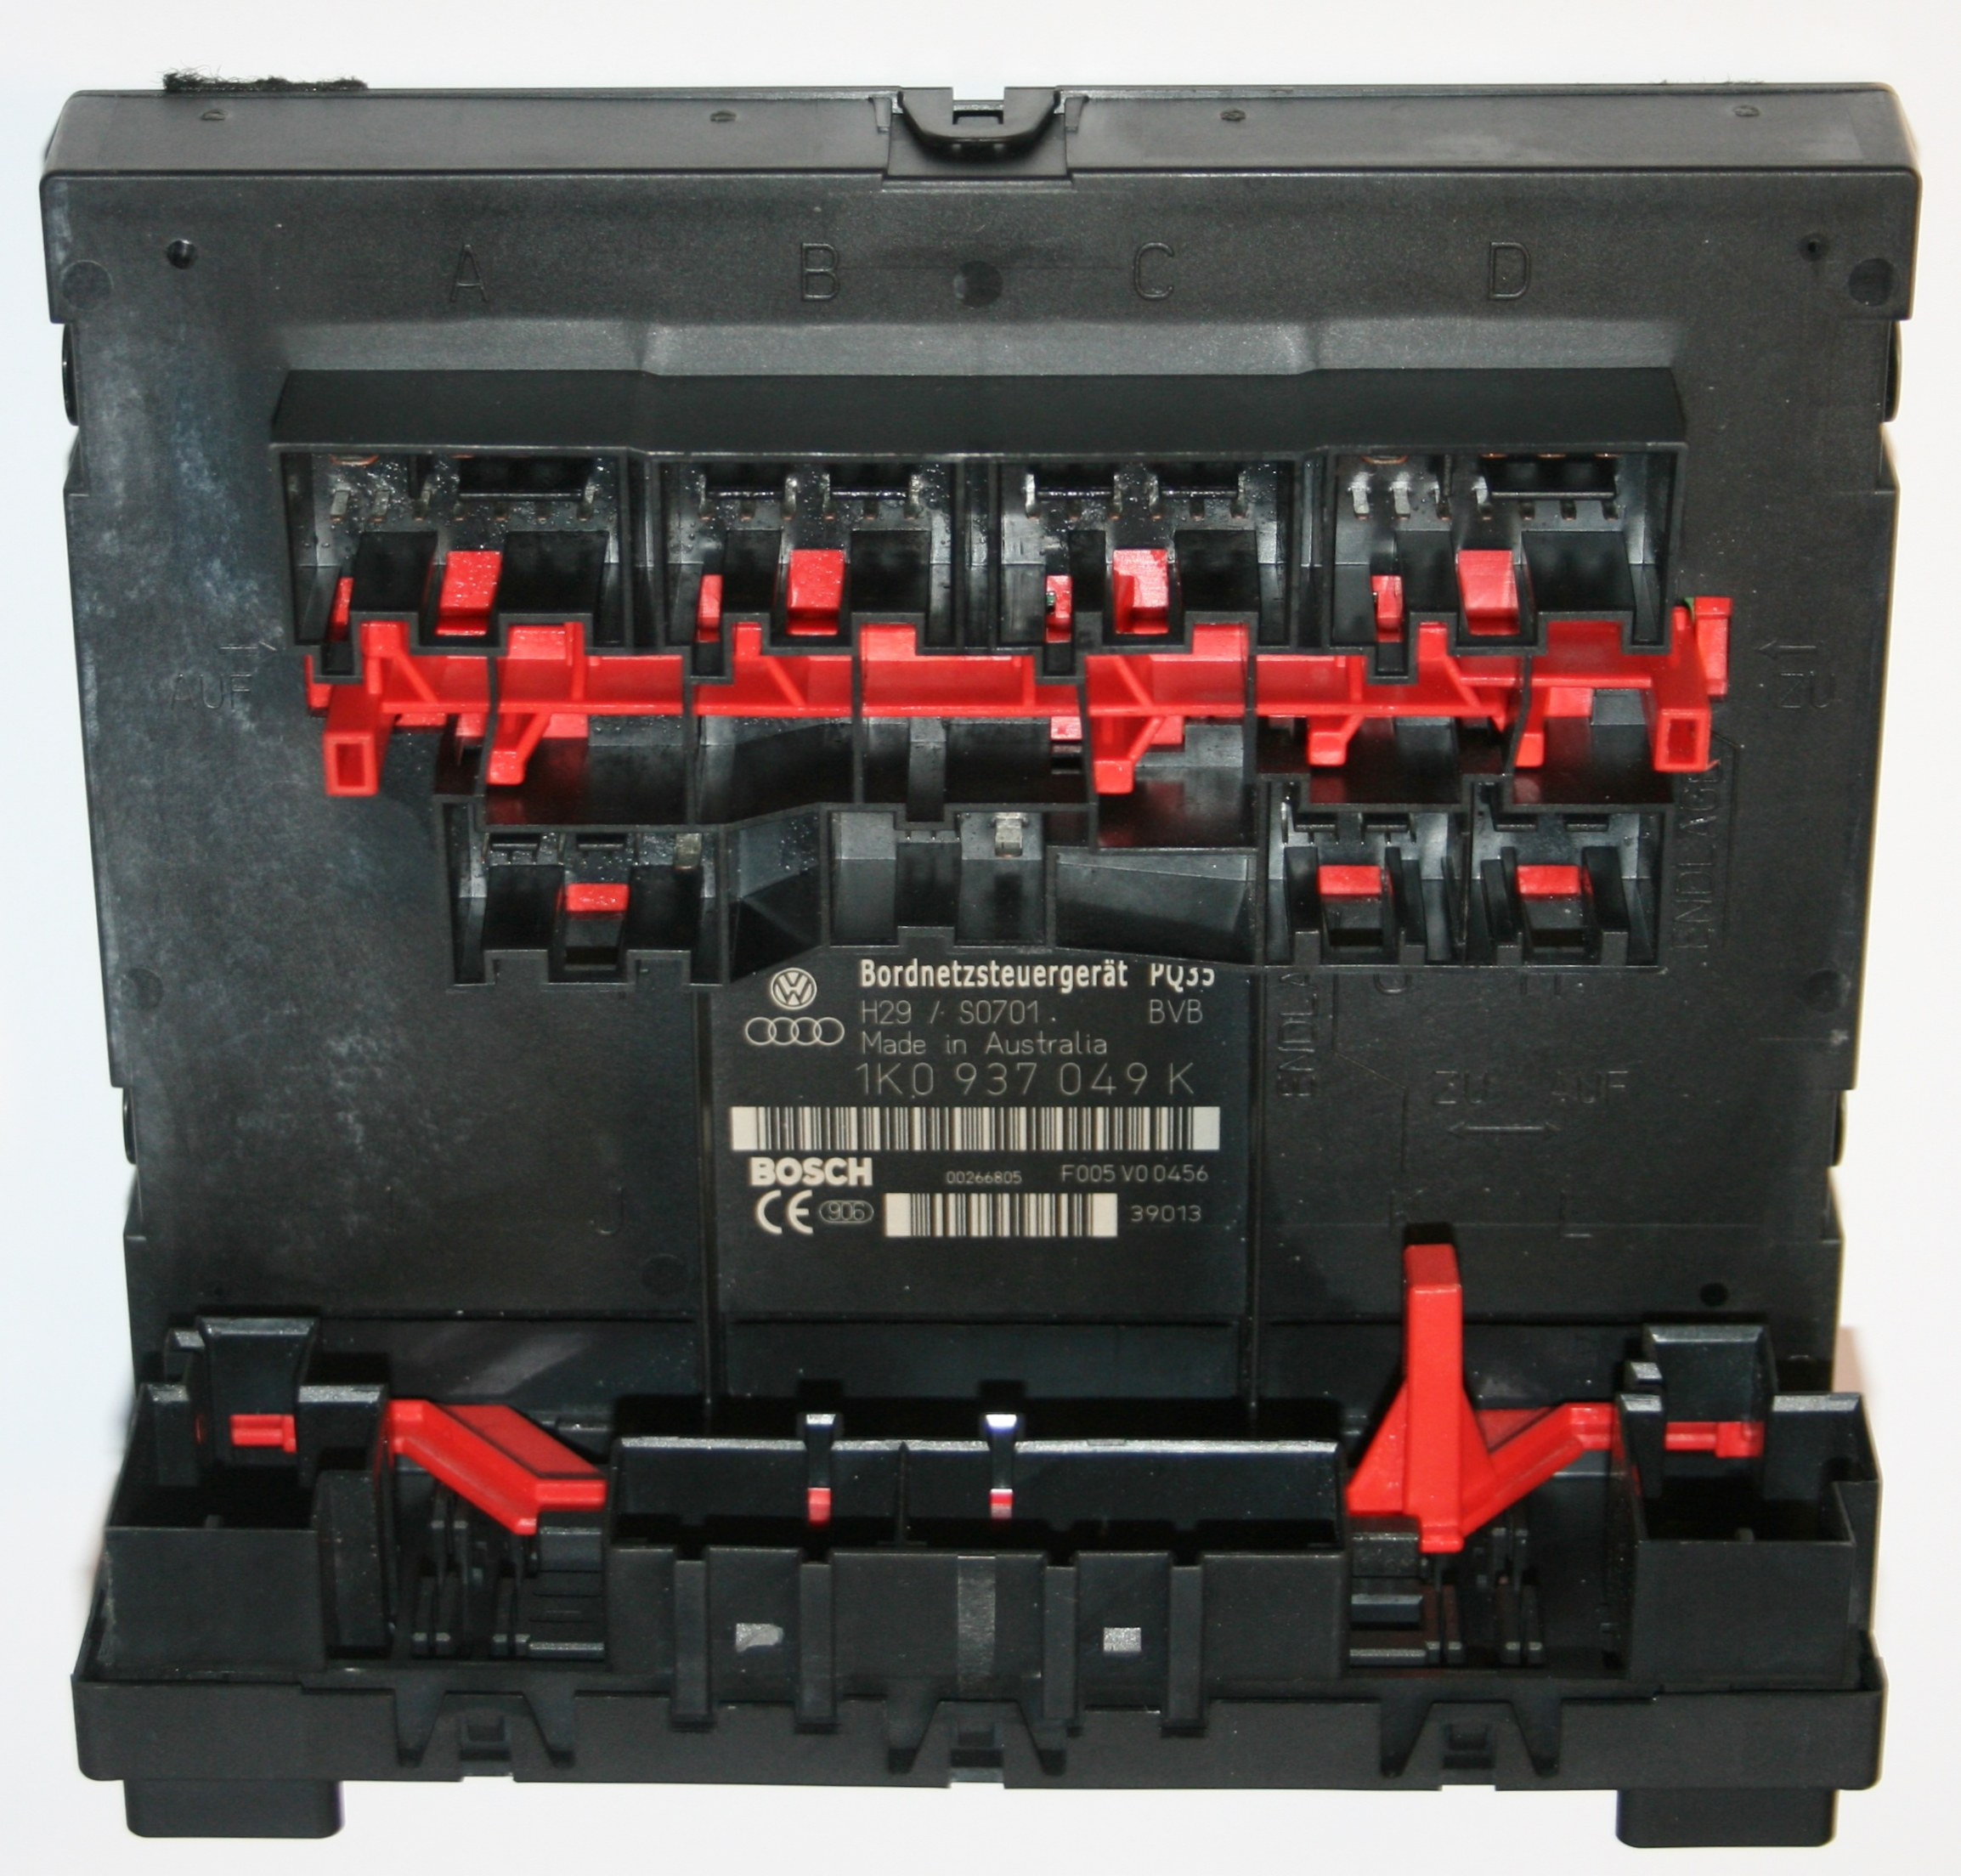 Used Genuine Vw Touran Central Locking Control Module 1k0 937 049 Volkswagen Exterior Light Wiring System Module2899